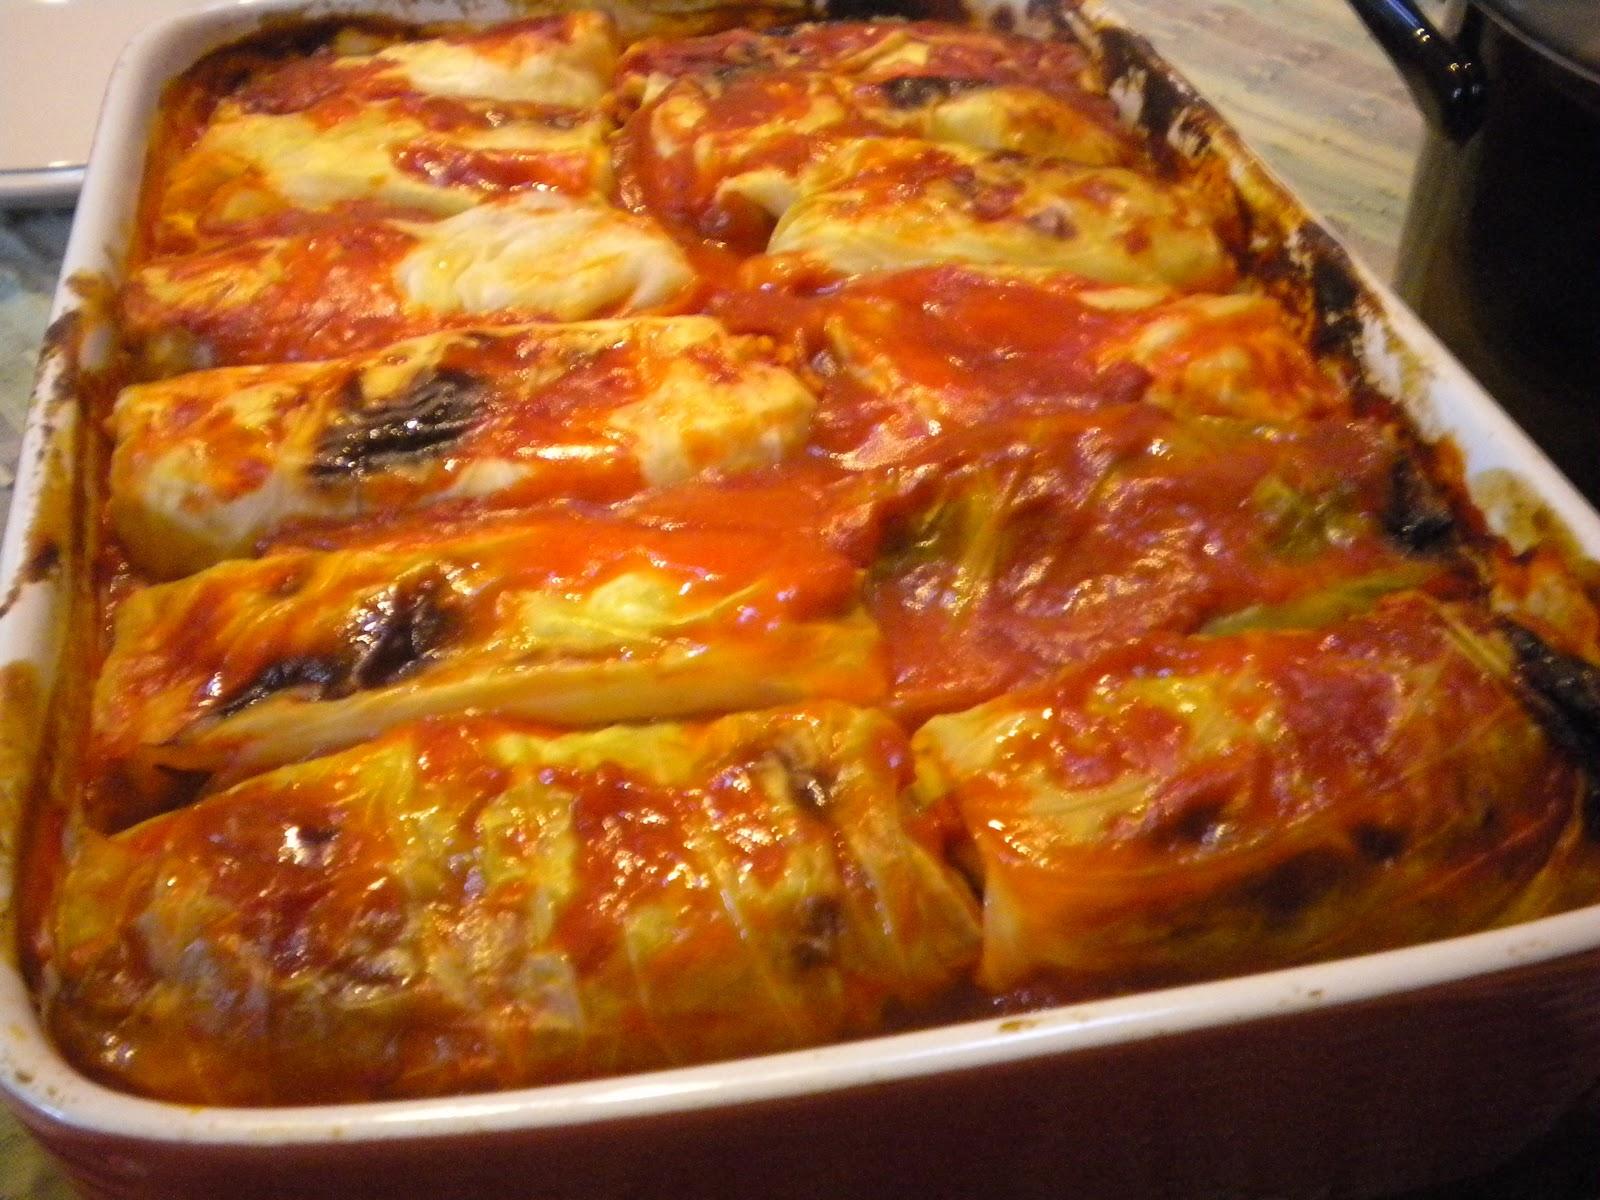 Gormandize: Posna Sarma (Croatian Rice-filled Cabbage Rolls)